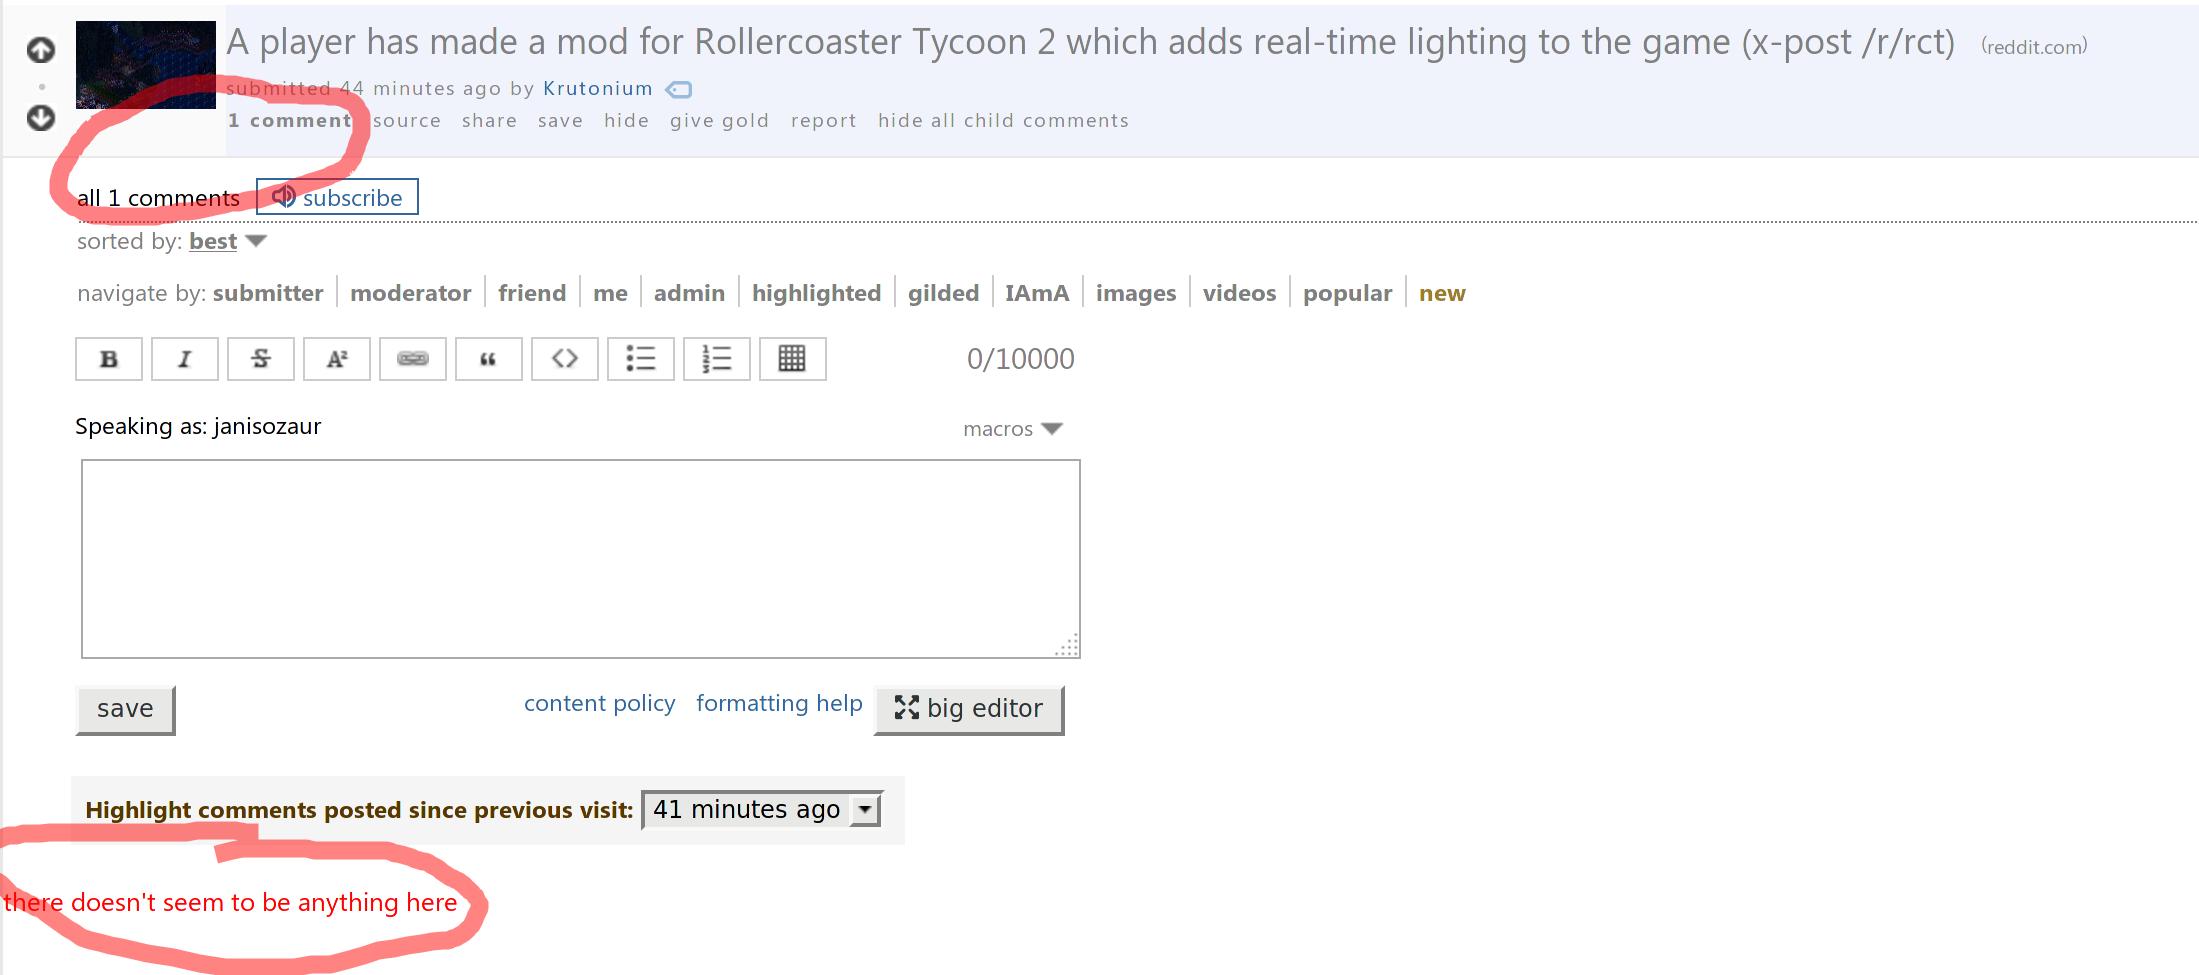 Rollercoaster Tycoon 2 Download Reddit